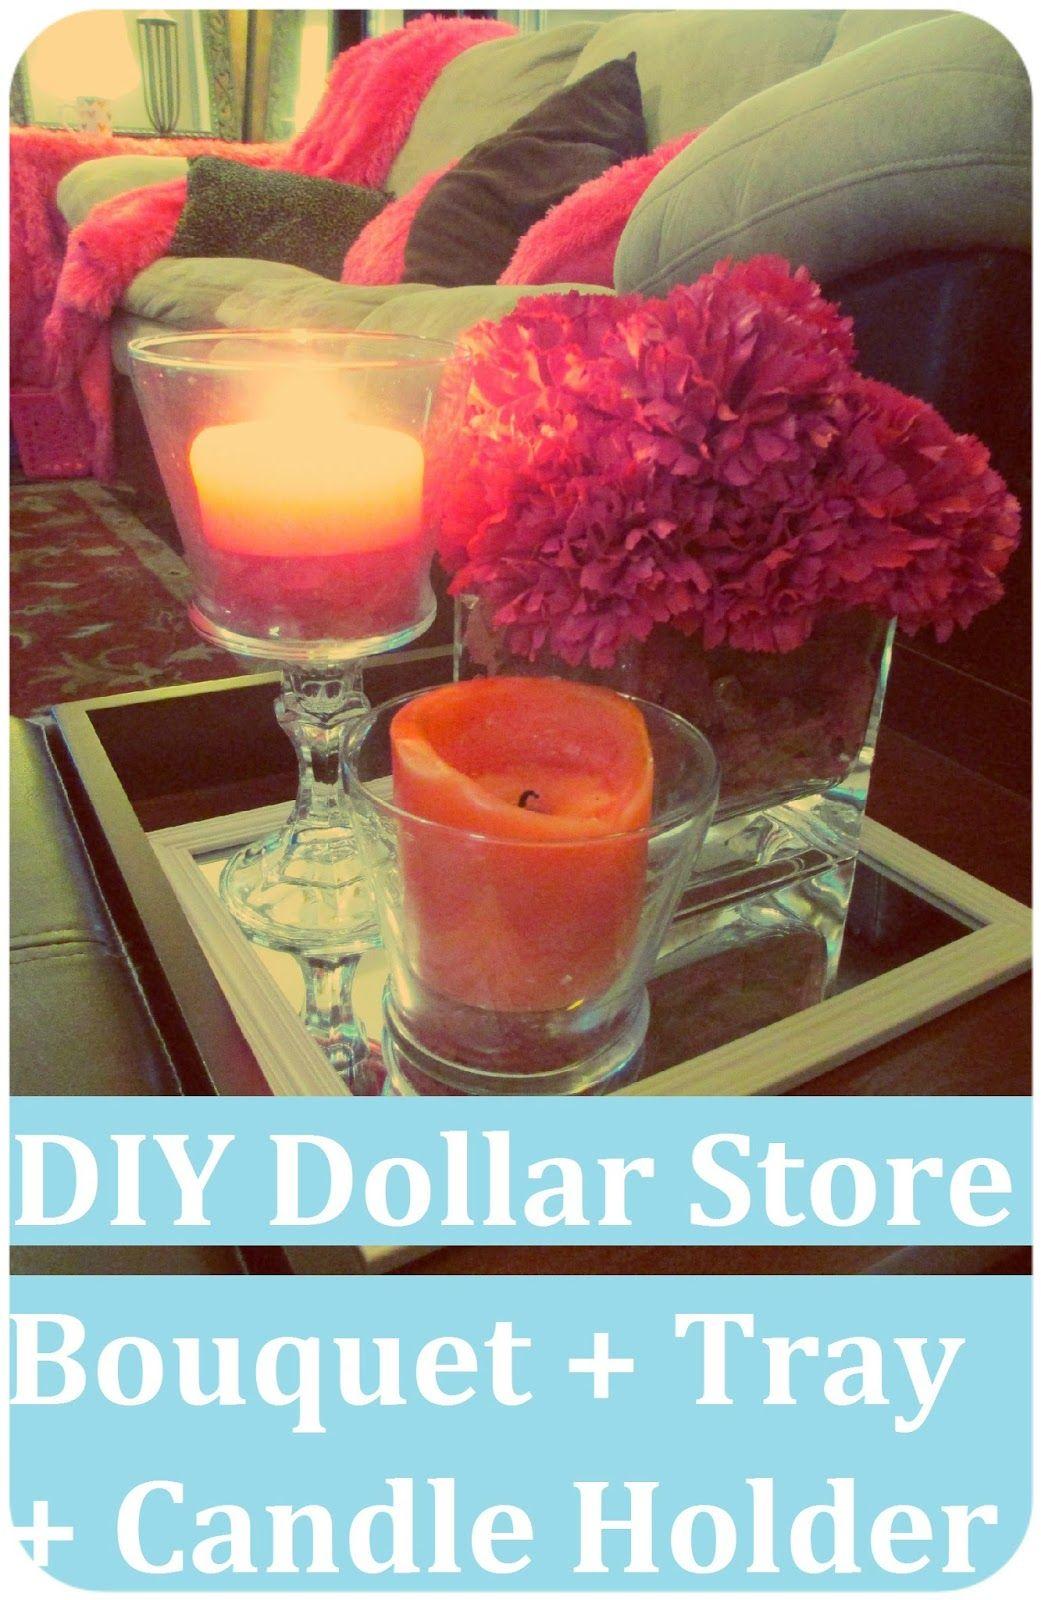 Diy Dollar Store Craft Flower Bouquet Candle Holder Tray From Dollar Tree Diy Ideas